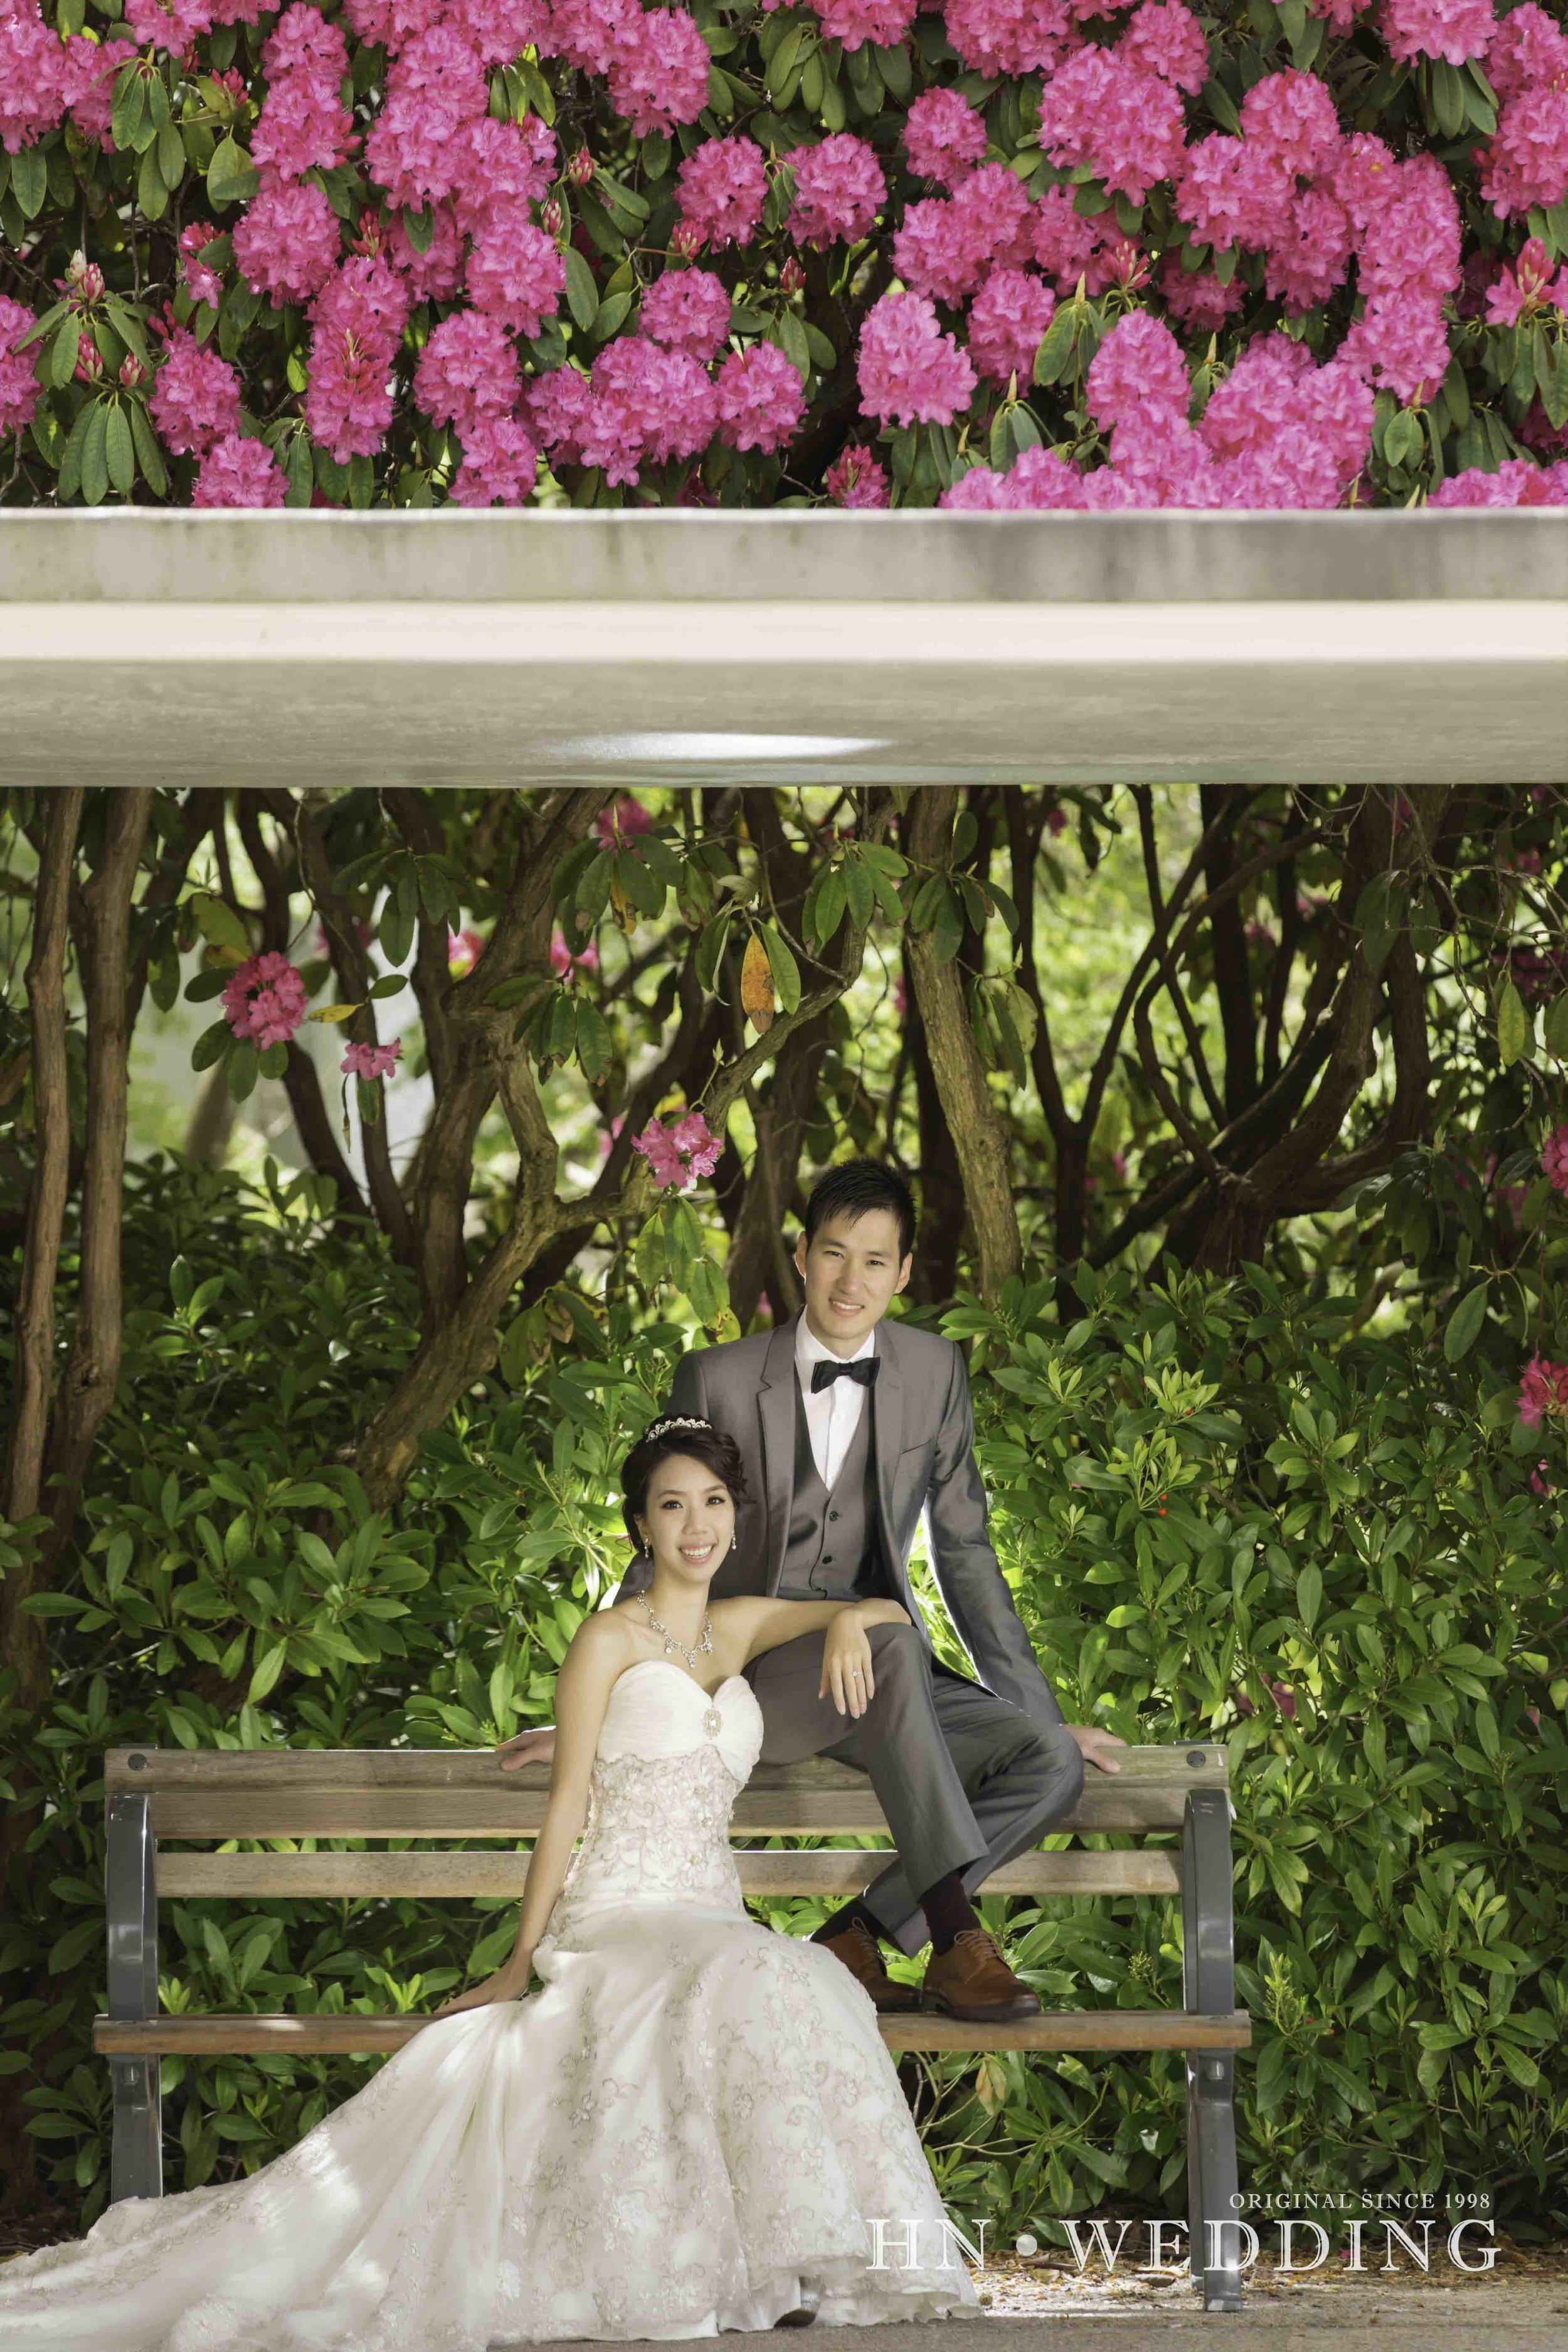 HNwedding-20170602-prewedding-9811.jpg